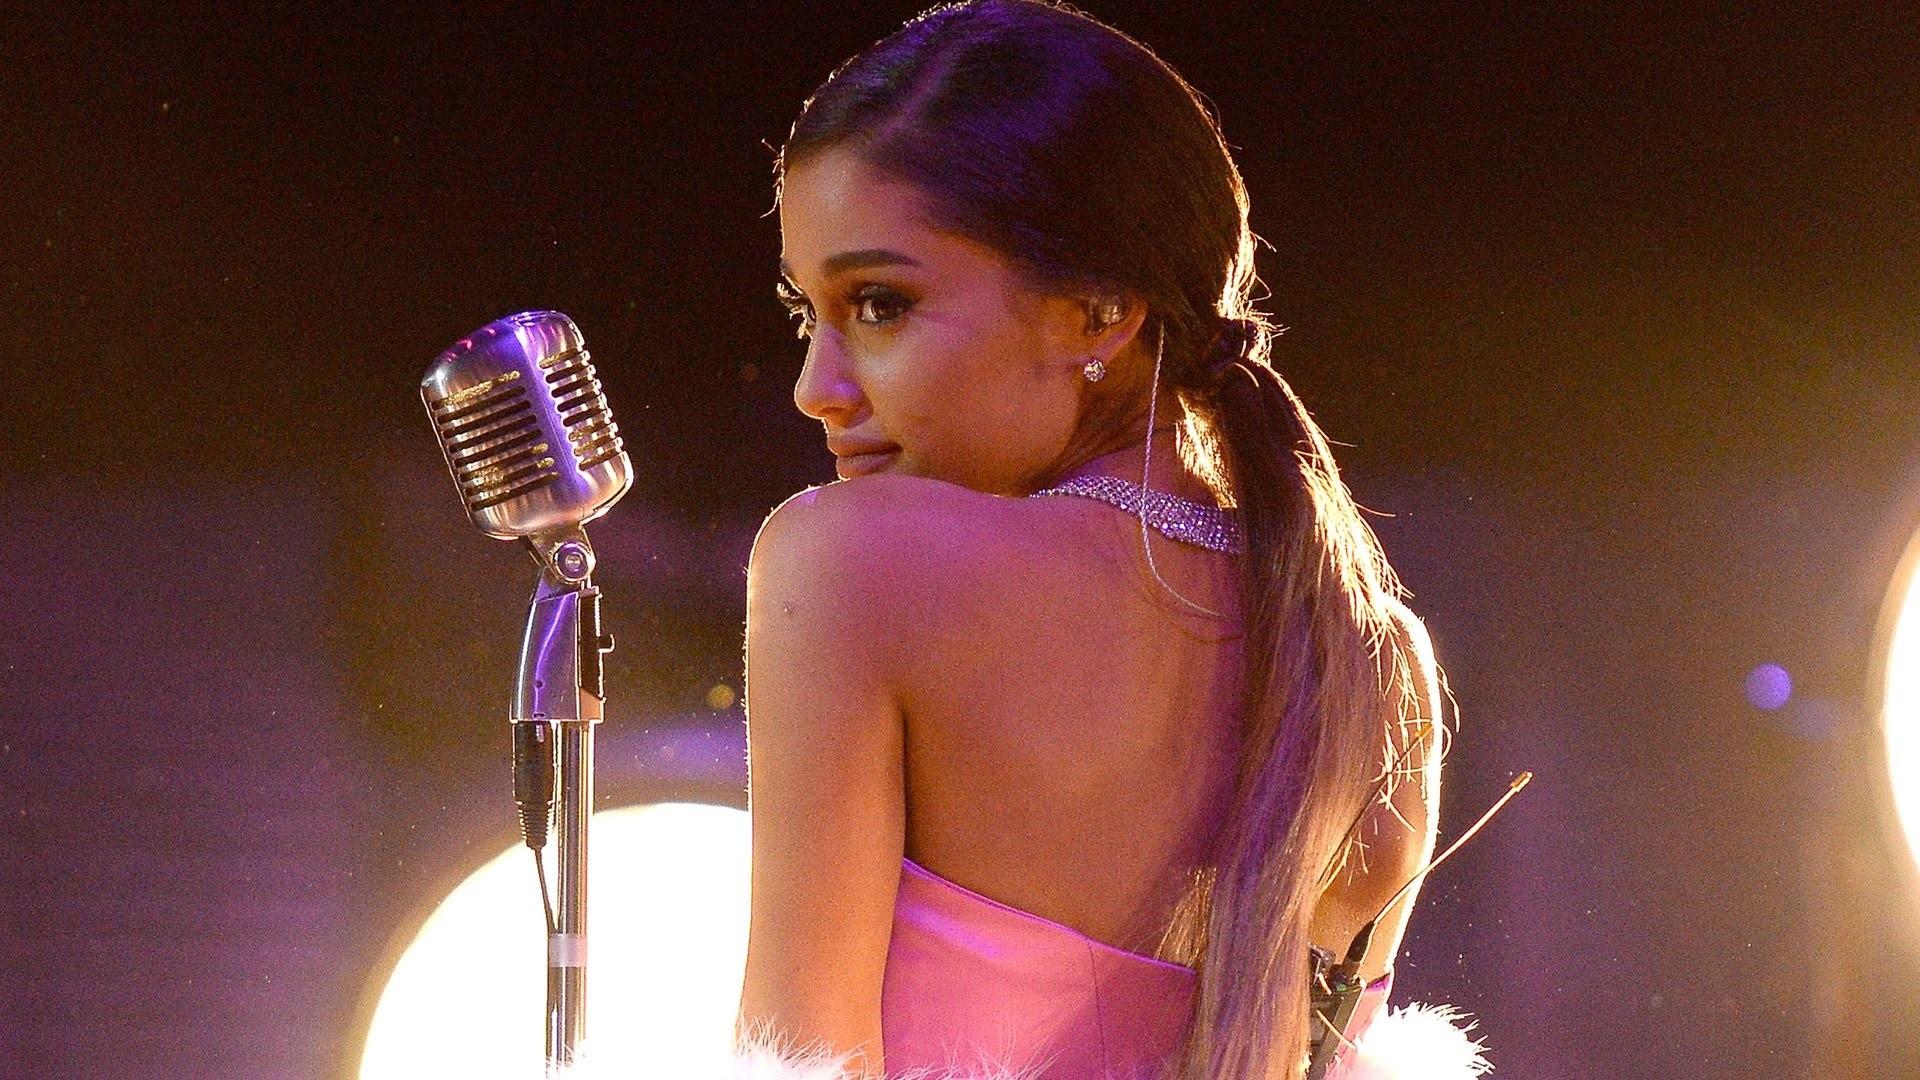 Ariana Grande Free Download Wallpaper